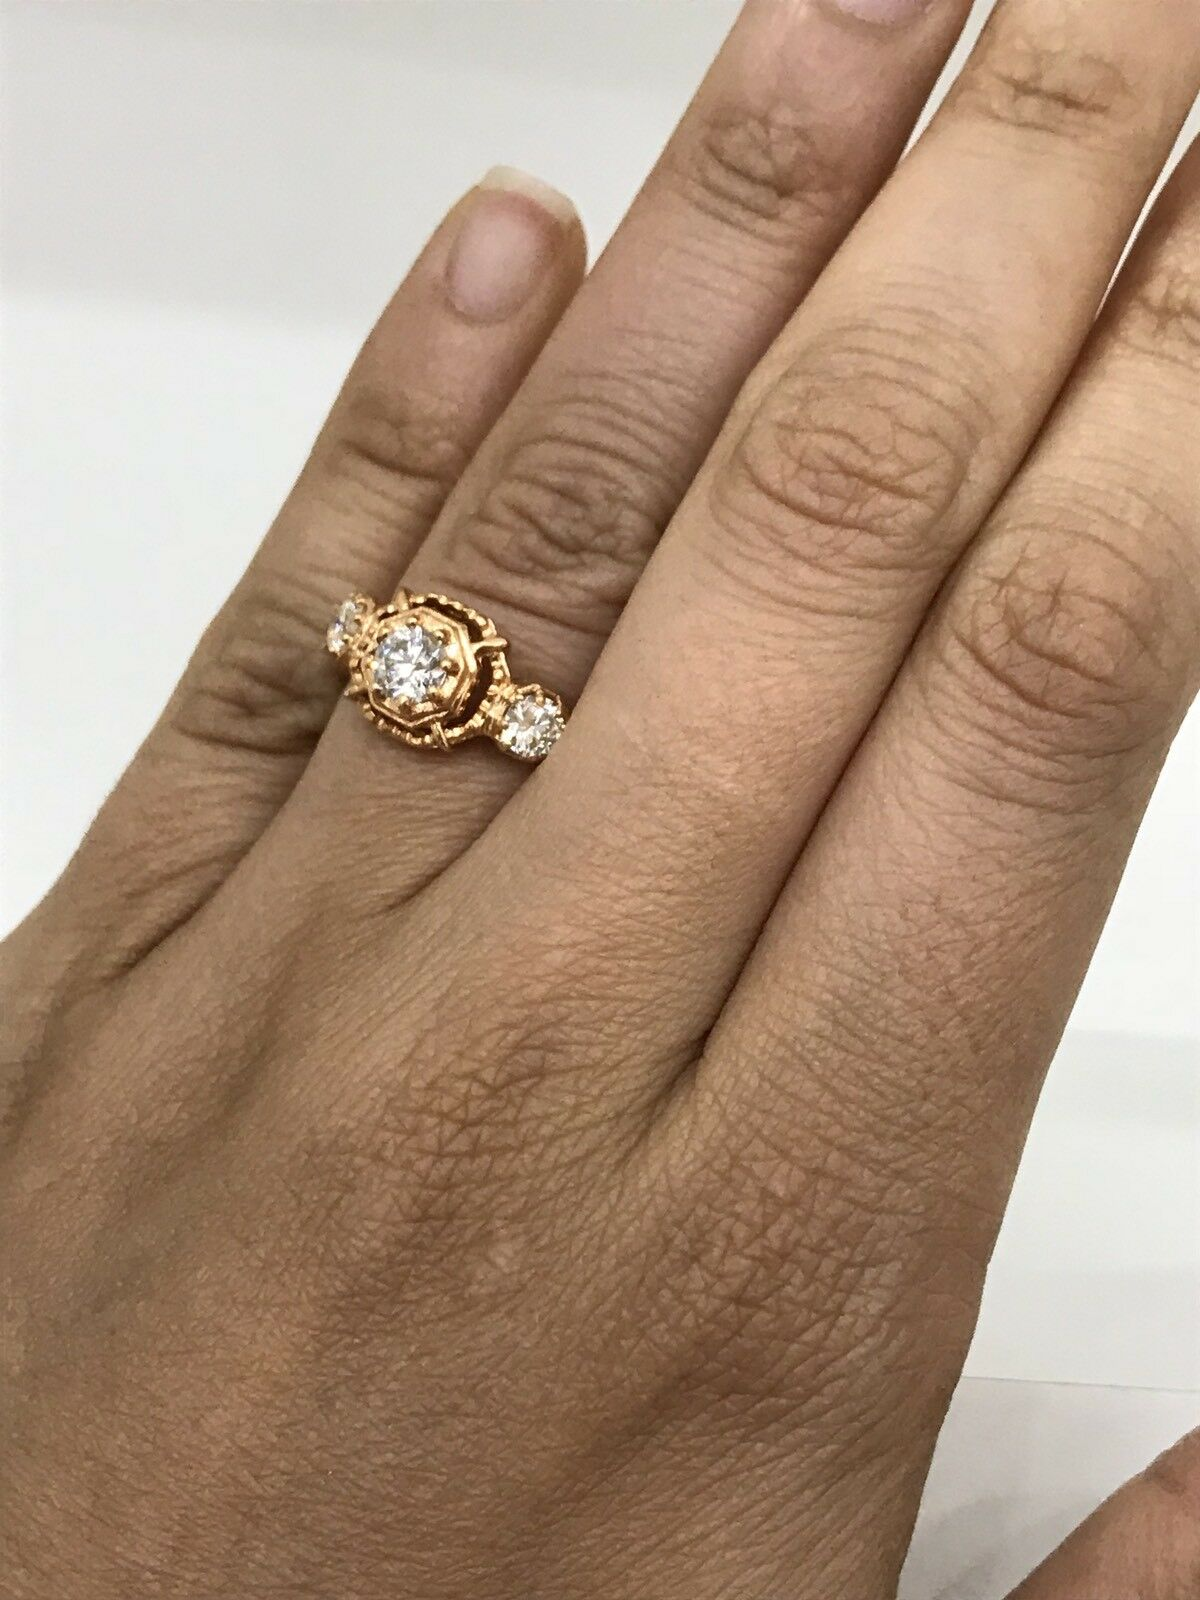 18KT pink gold ART-DECO DIAMOND RING SIZE 7 1.01 CTTW